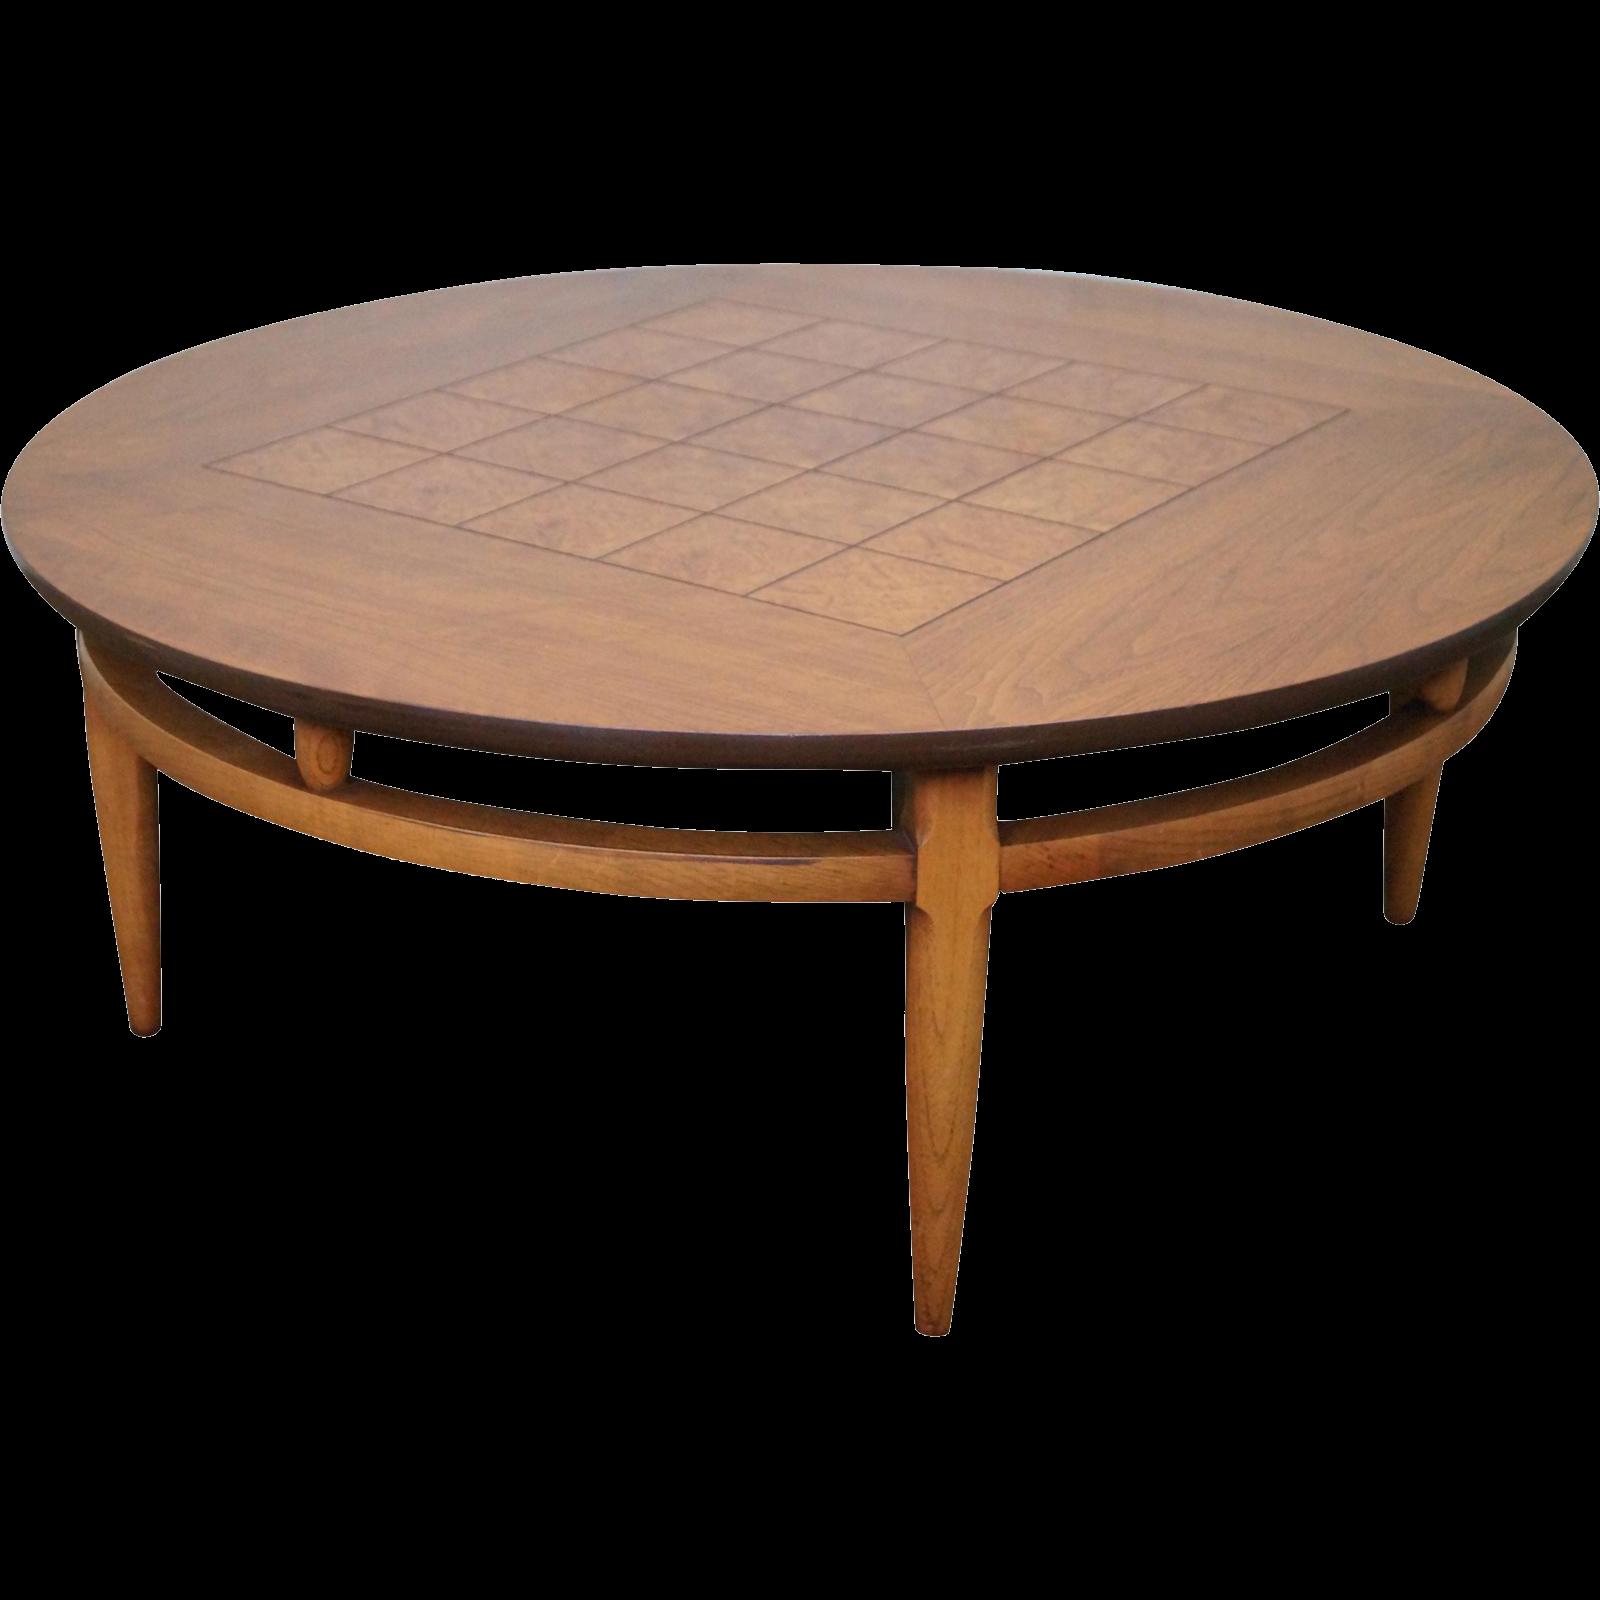 Lane Round Burl Walnut Mid Century Coffee Table From Bucks